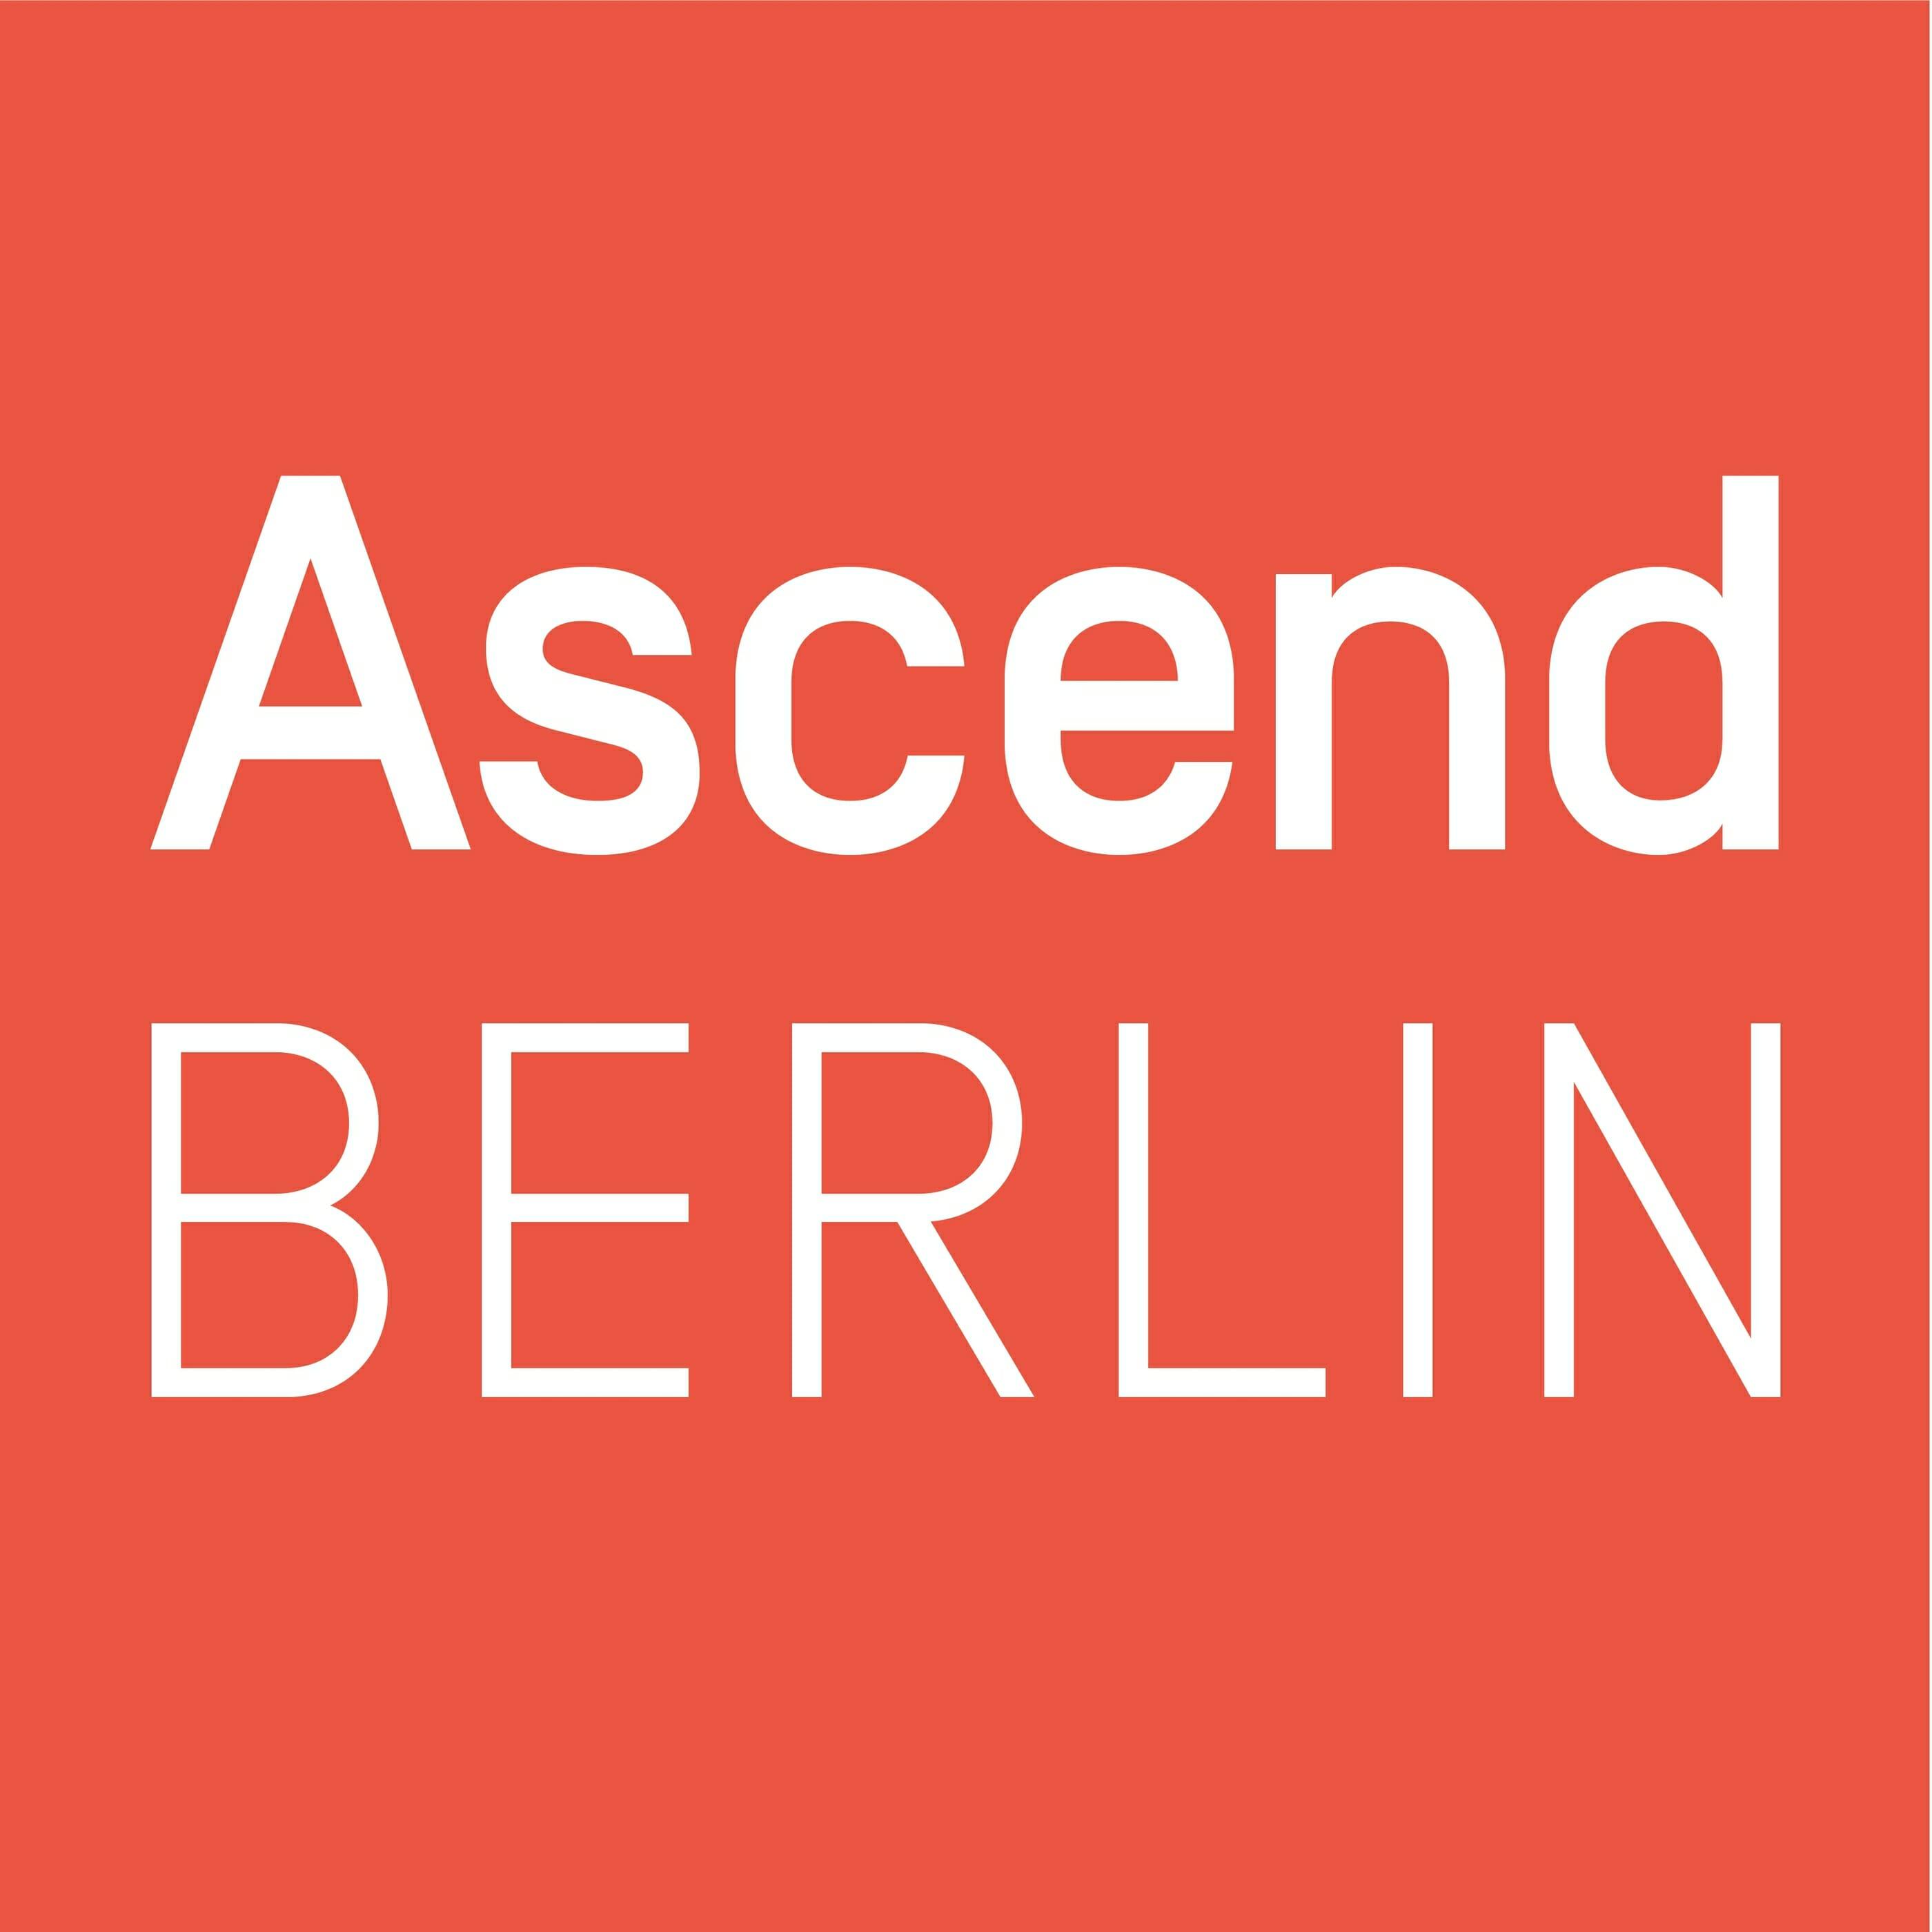 ascend_logo_vertikal_rot